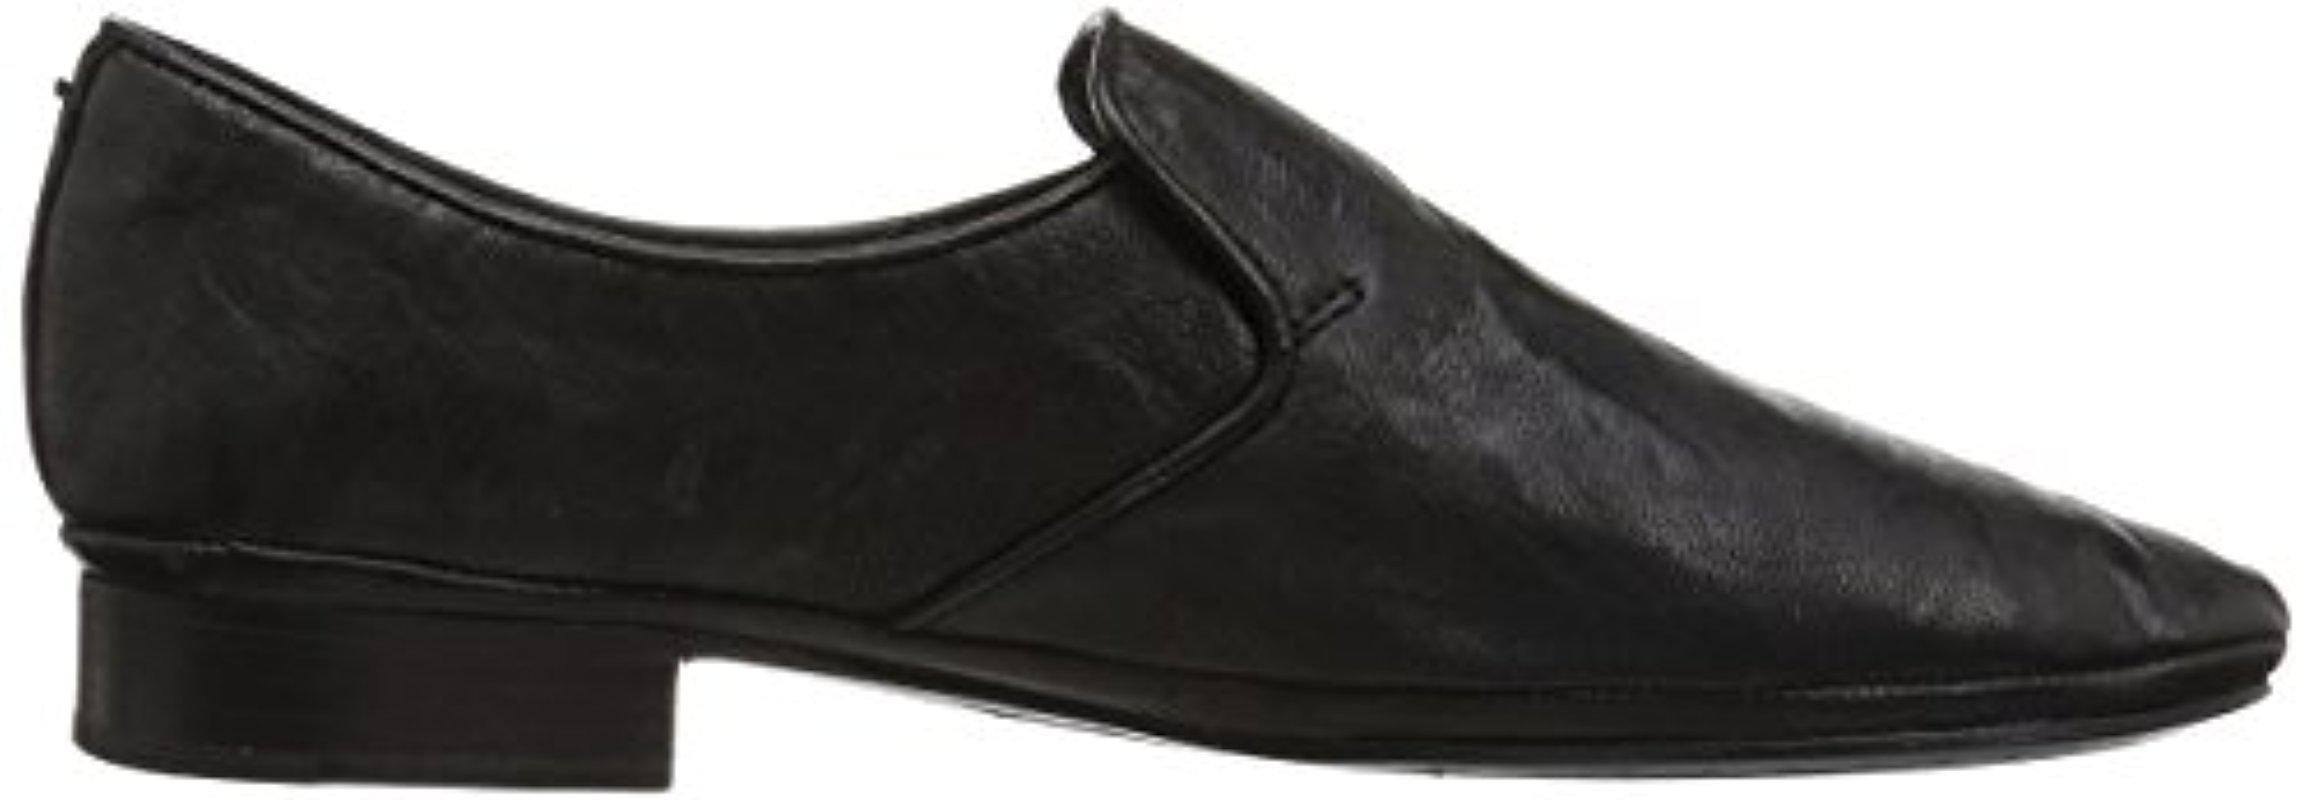 Details about  /Frye Women/'s Ashley Slip on Loafer Flat